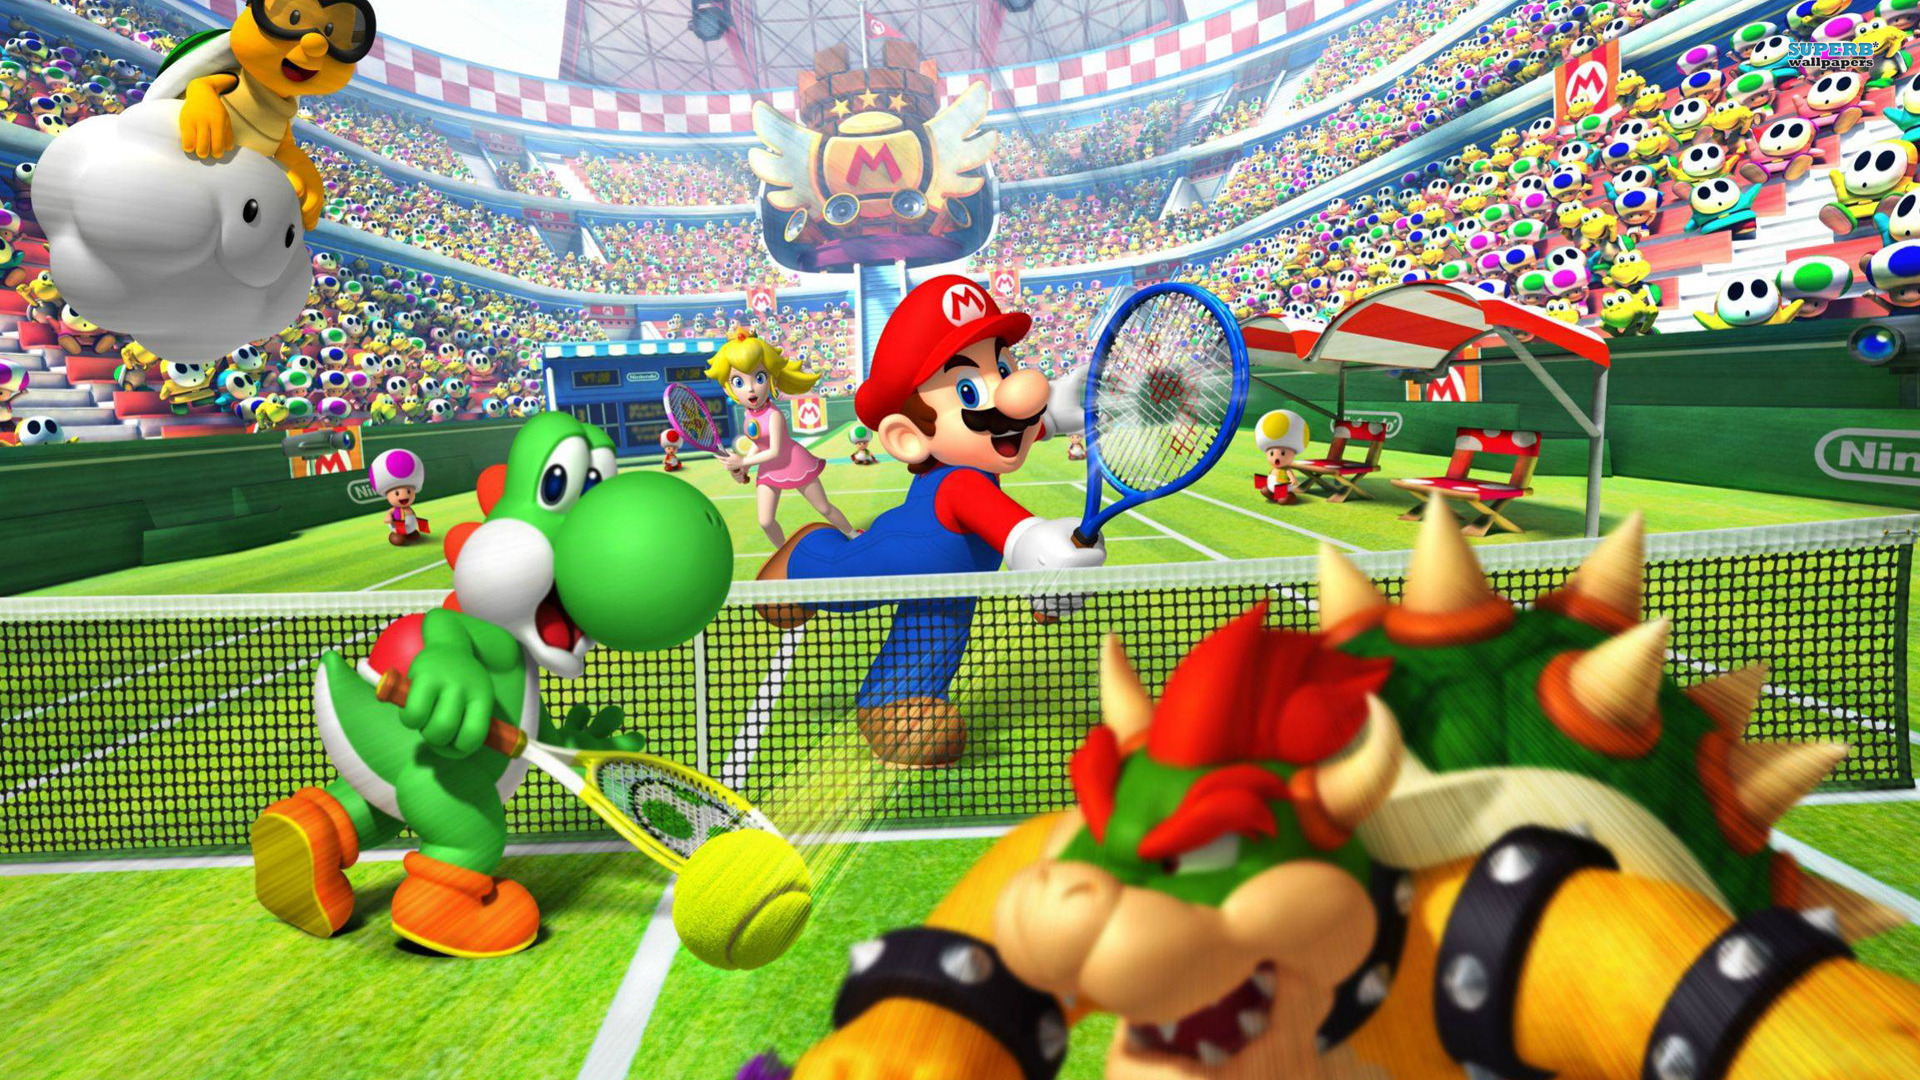 3d Mushroom Wallpaper Free Download Mario Wallpaper Hd Pixelstalk Net